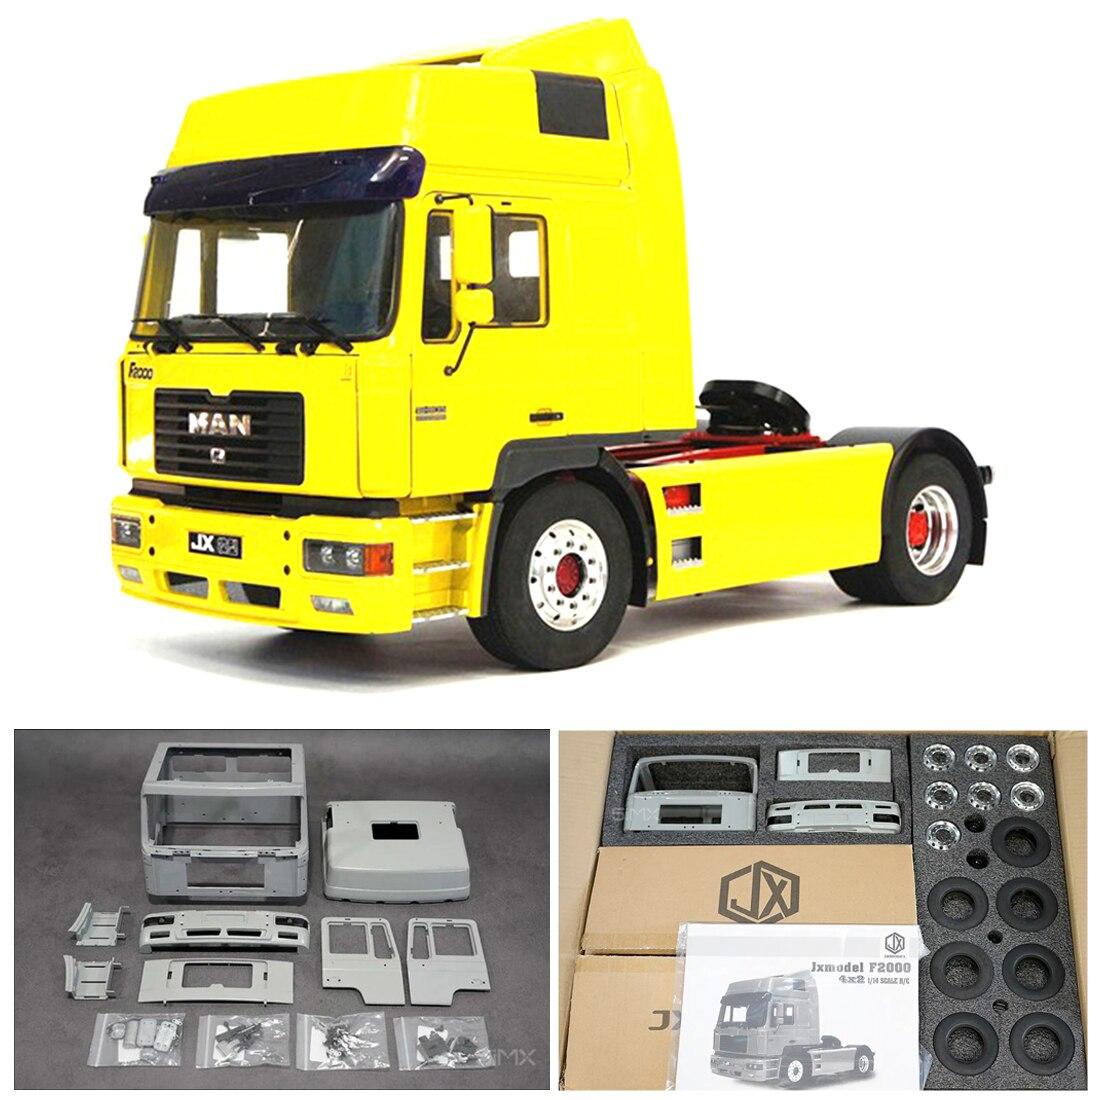 JXmodel 1/14 4x2 سبائك الألومنيوم شاحنة تعمل بجهاز التحكم عن بعد مقطورة RC شاحنة جرار للأطفال ألعاب تعليمية هدية عدة الإصدار